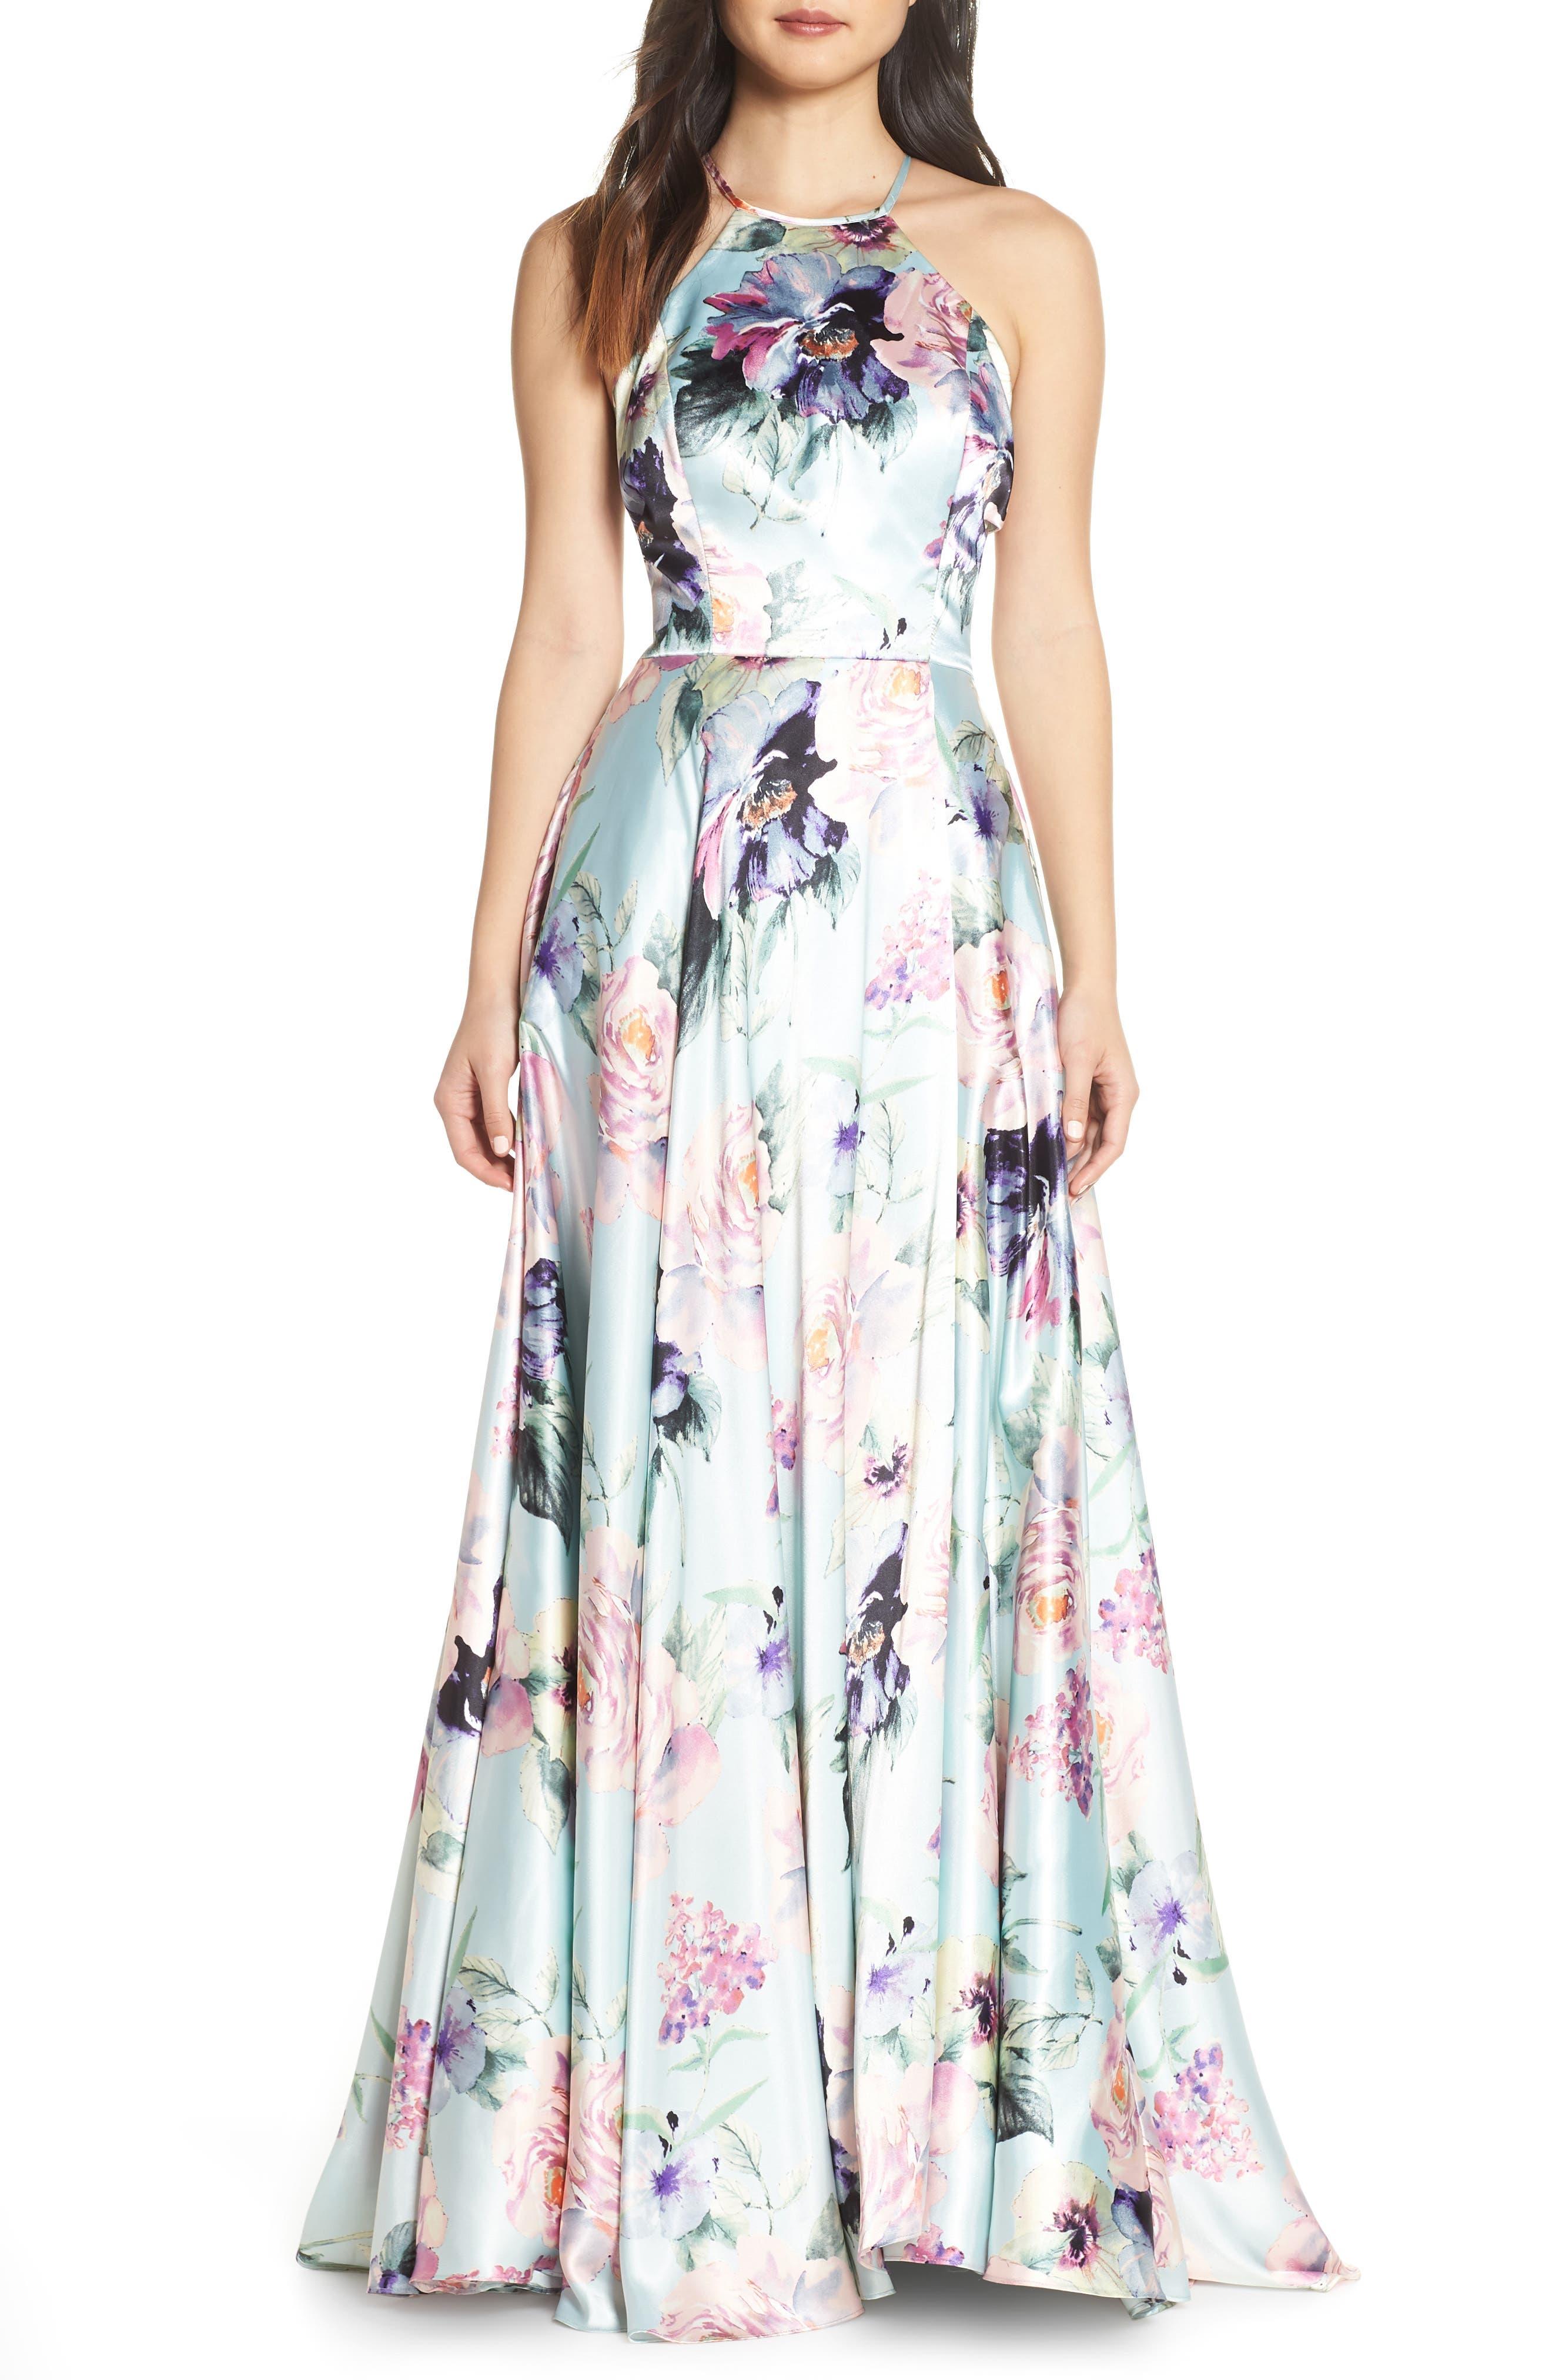 BLONDIE NITES,                             Floral Print Charmeuse Evening Dress,                             Main thumbnail 1, color,                             MINT/ MULTI